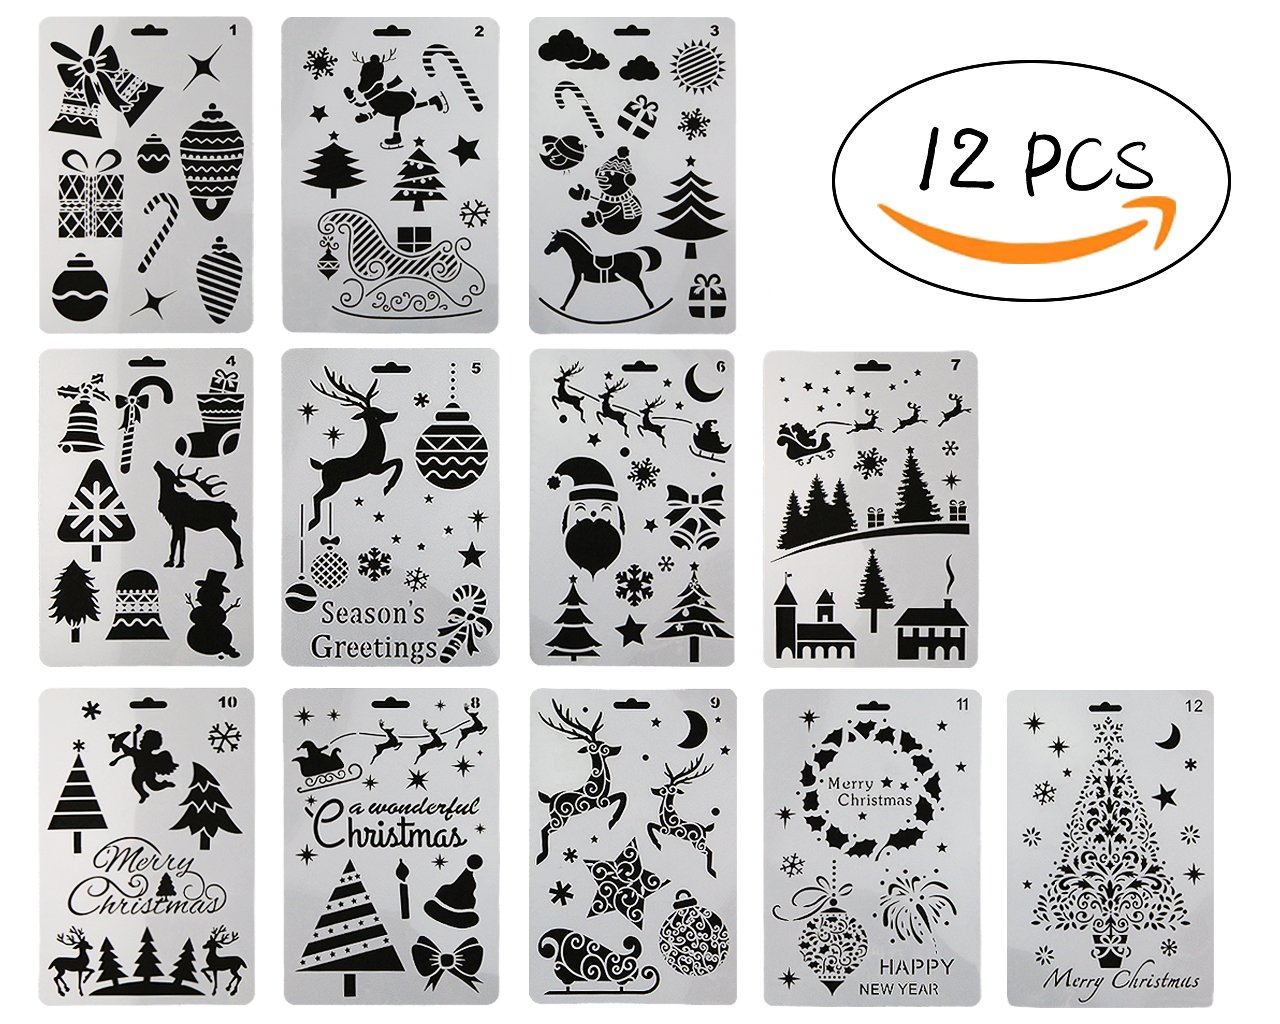 12 Pcs Plastic Painting Stencil,Christmas Themes Santa Claus Snowman Christmas Tree Snow Elk Jingle Bell Drawing Spraying Templates 10